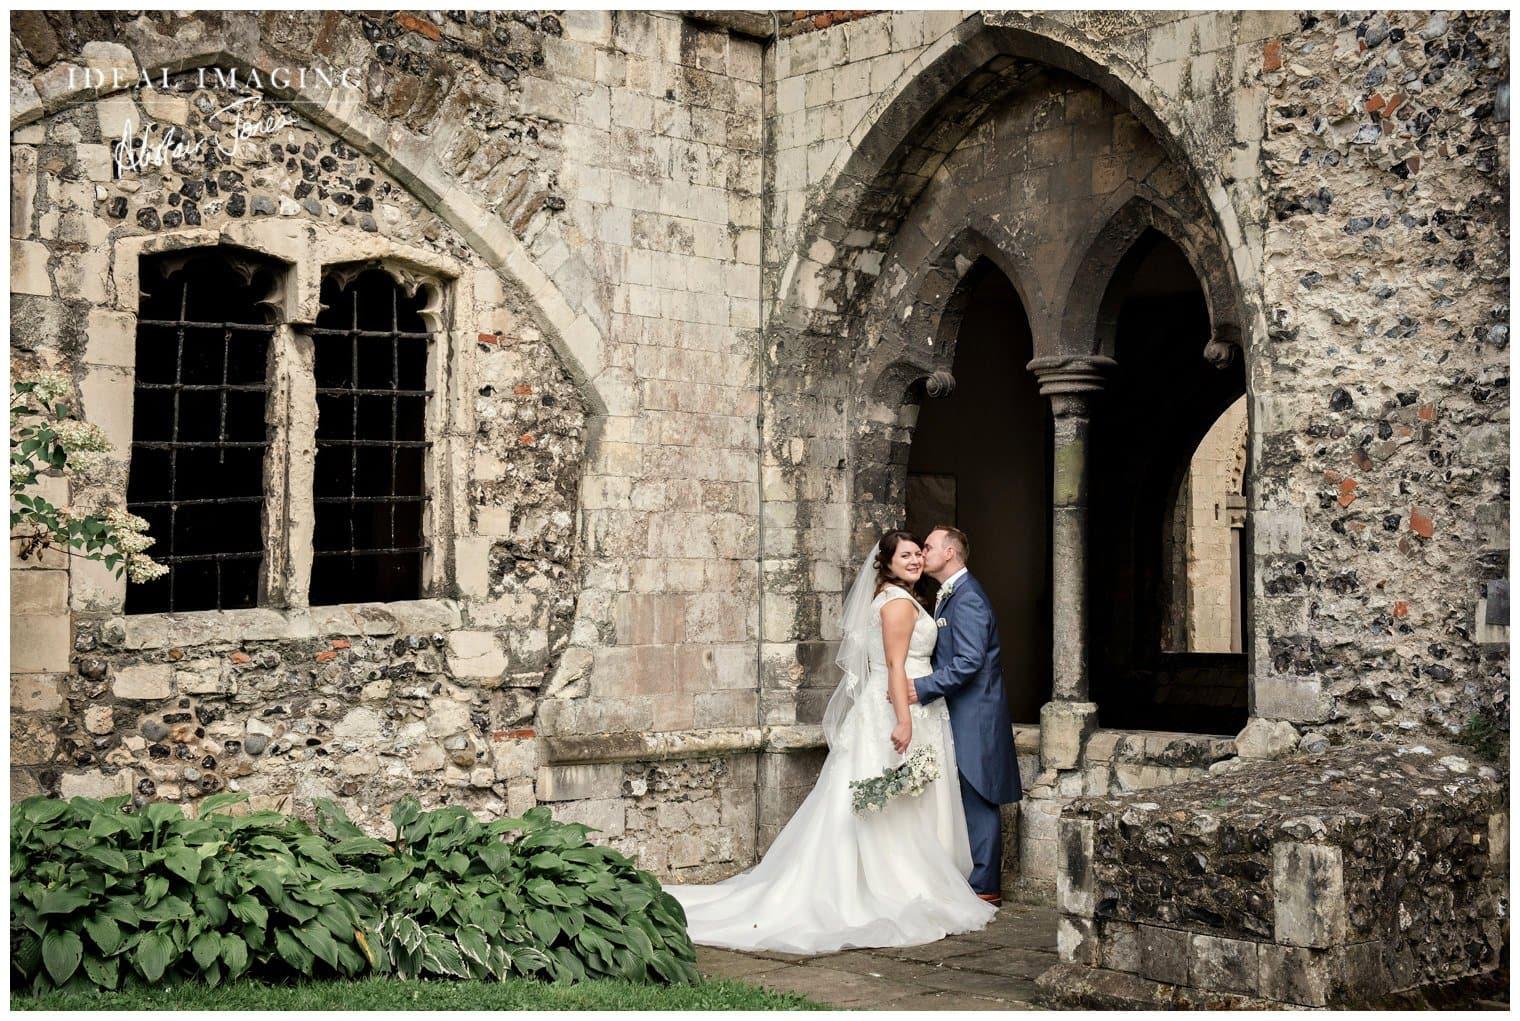 canterbury_cathedral_wedding-099